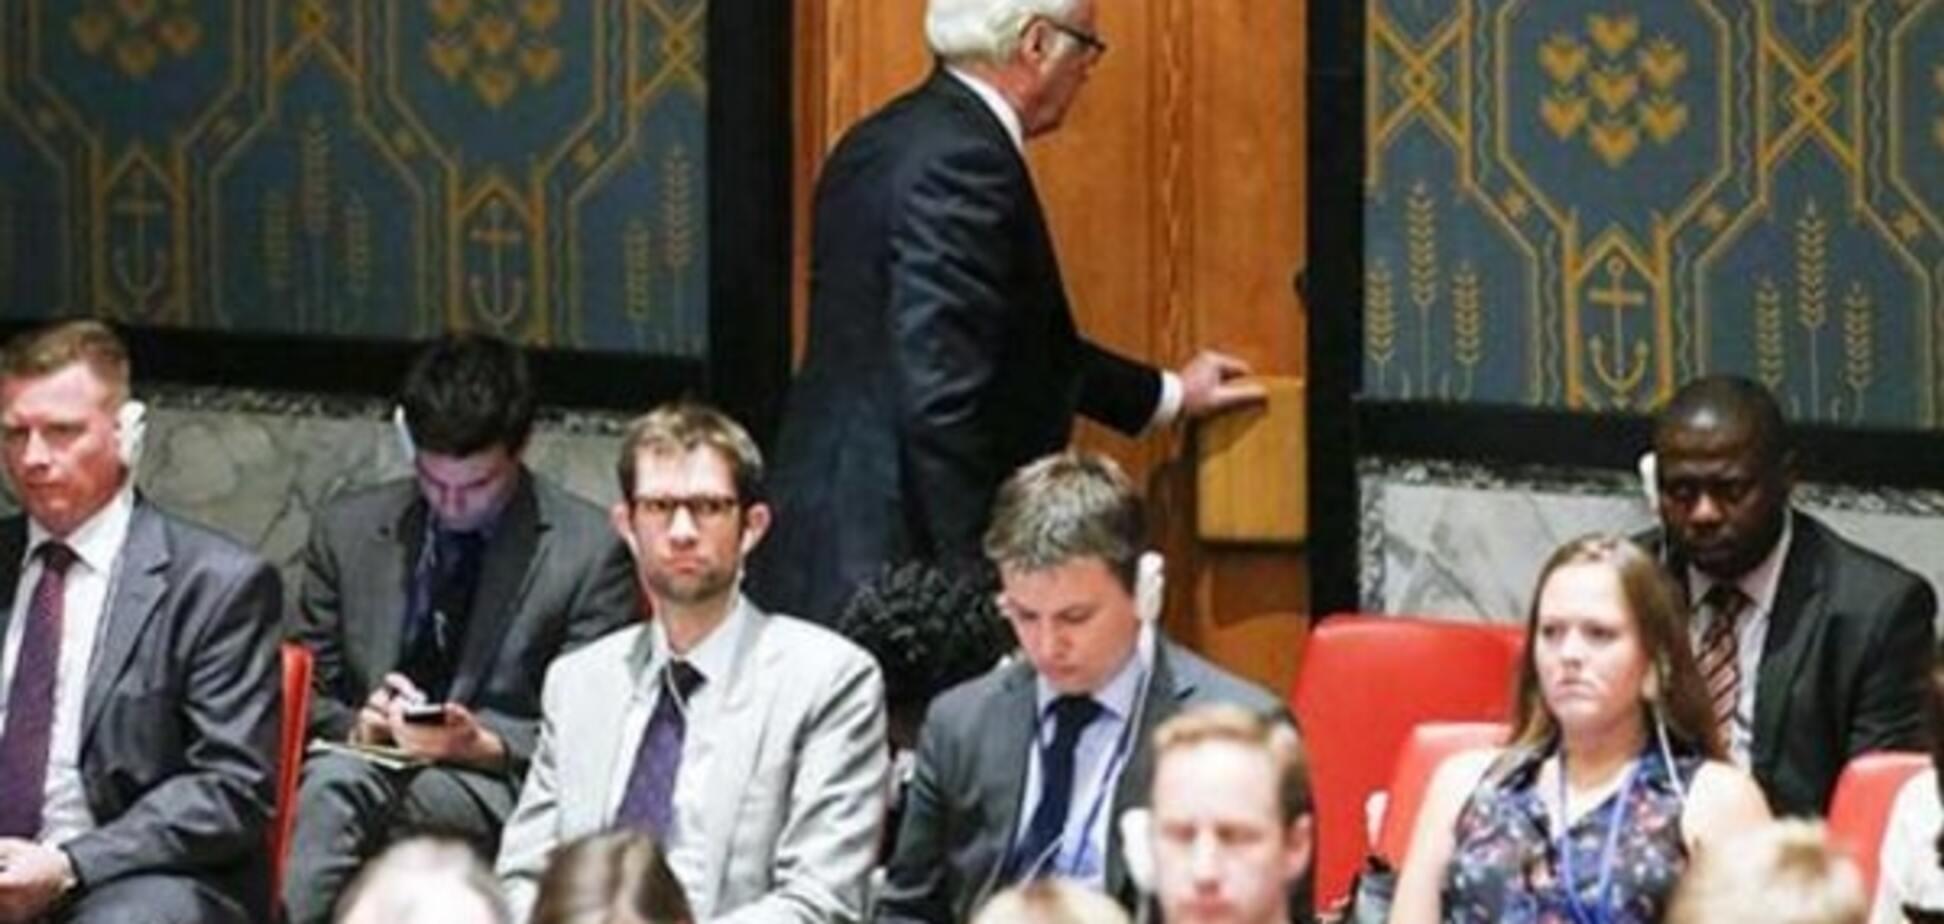 'Сбежали в буфет'. Соцсети высмеяли 'демарш' россиян на Генассамблее ООН